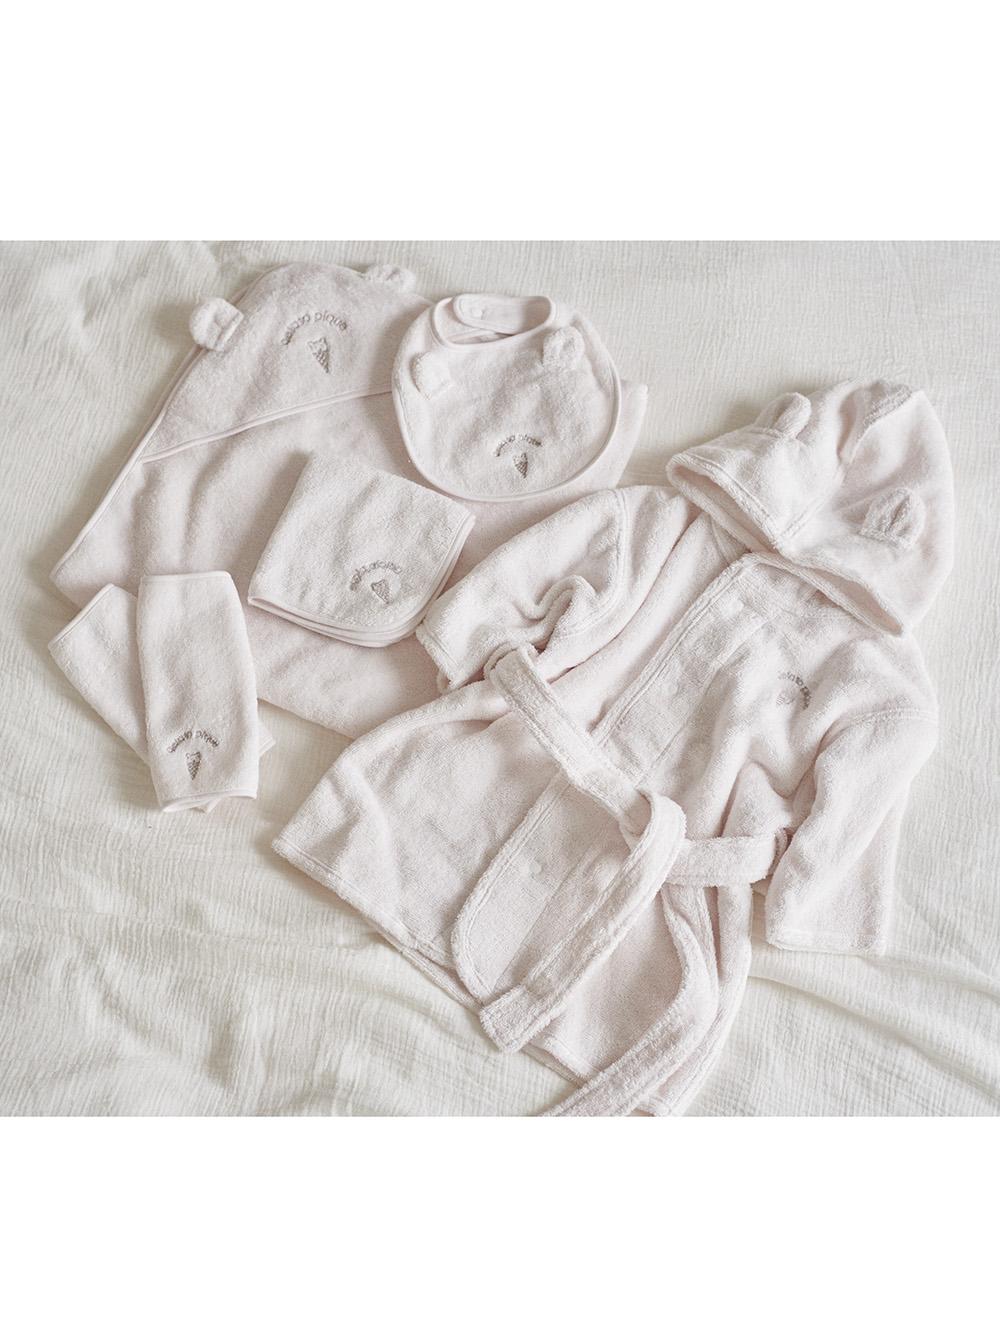 【EC限定】 baby タオルサッキングパッド | PBGG209050